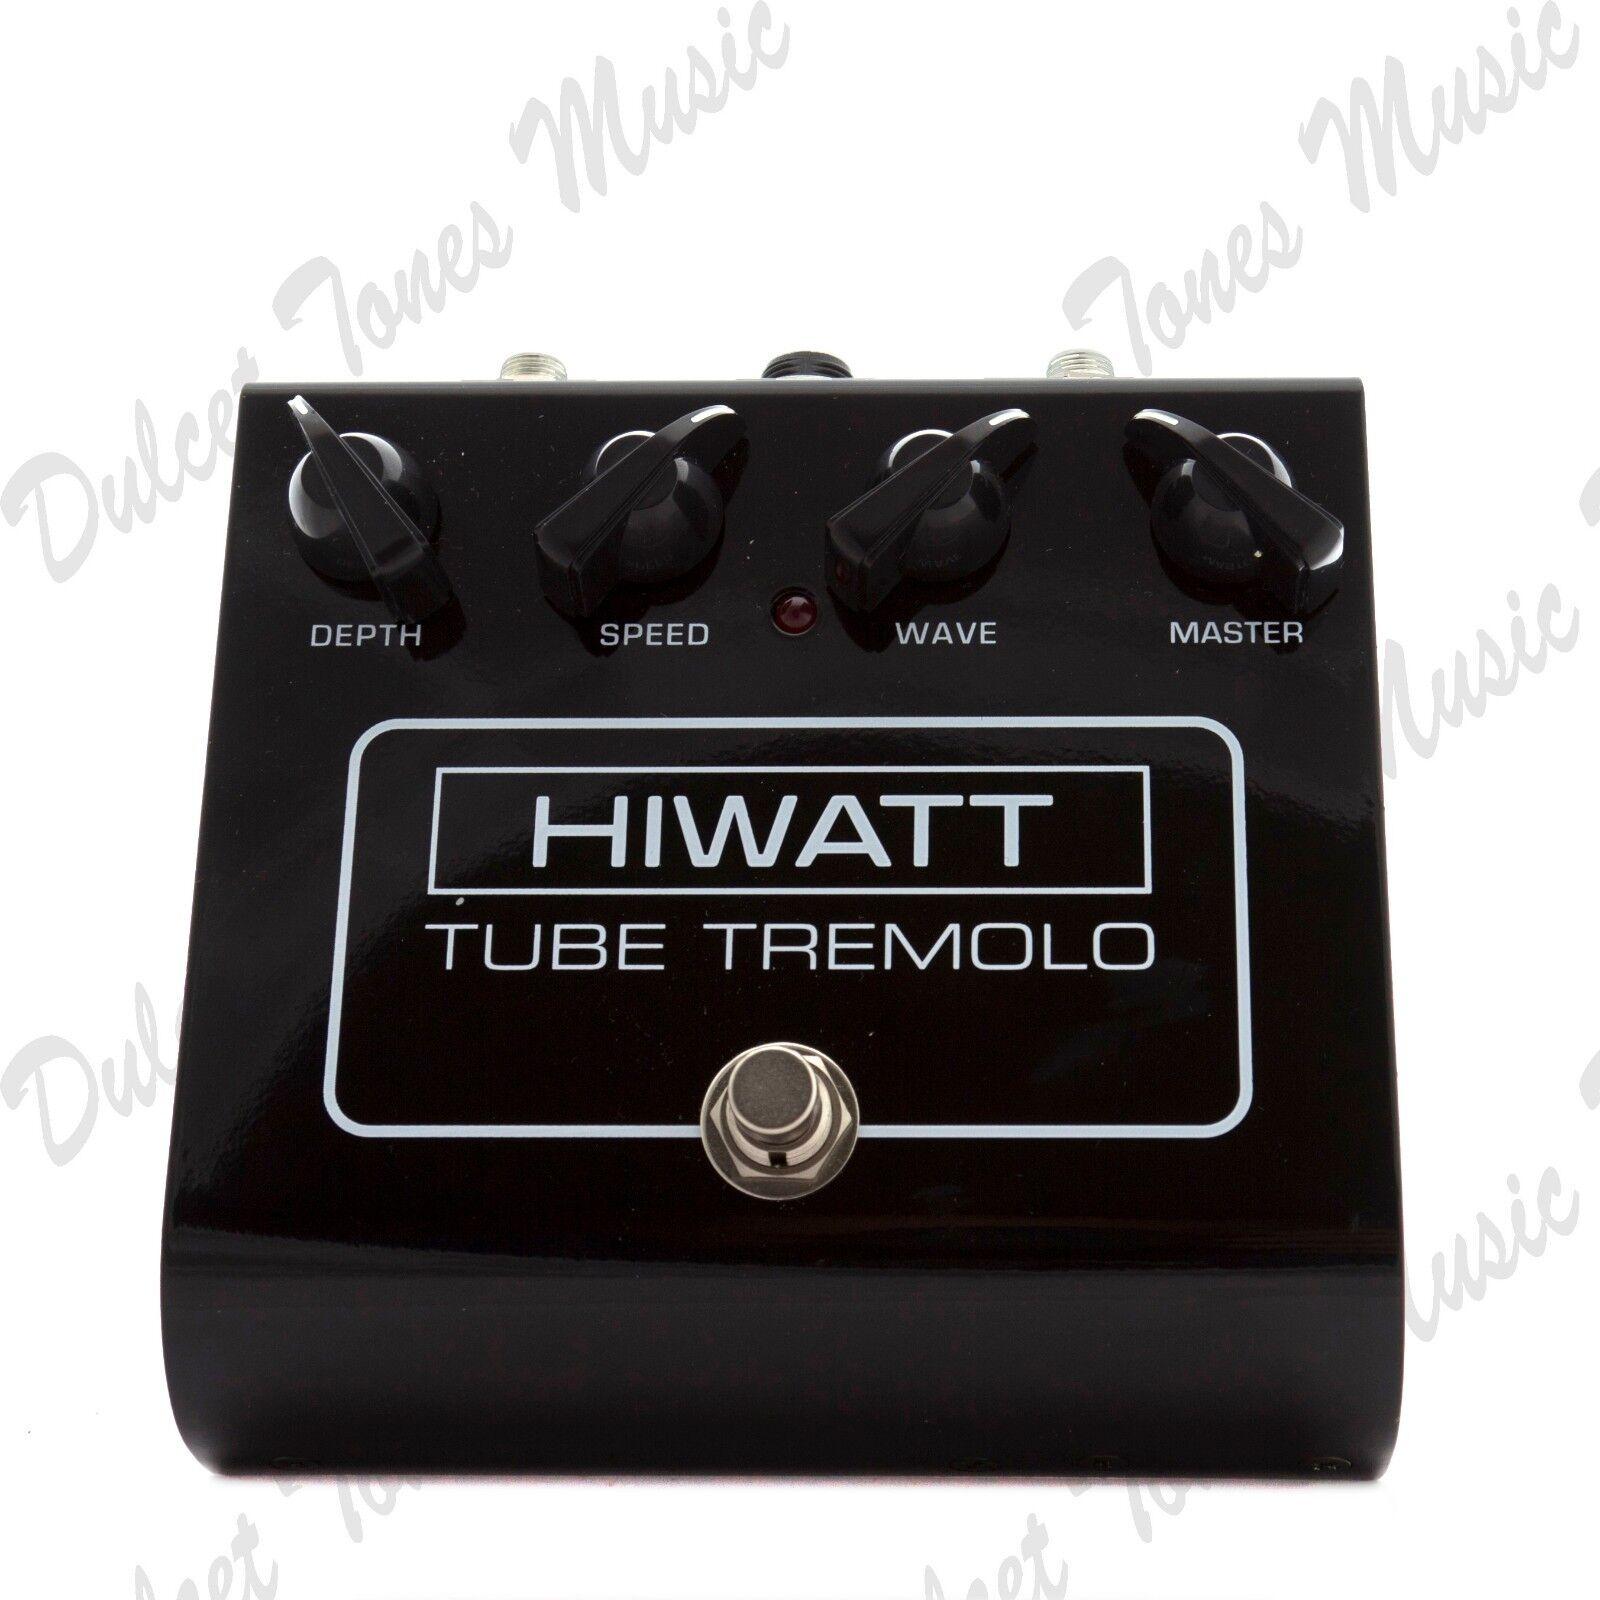 HiWatt Tube Tremolo Guitar Effects Pedal FAST DISPATCH